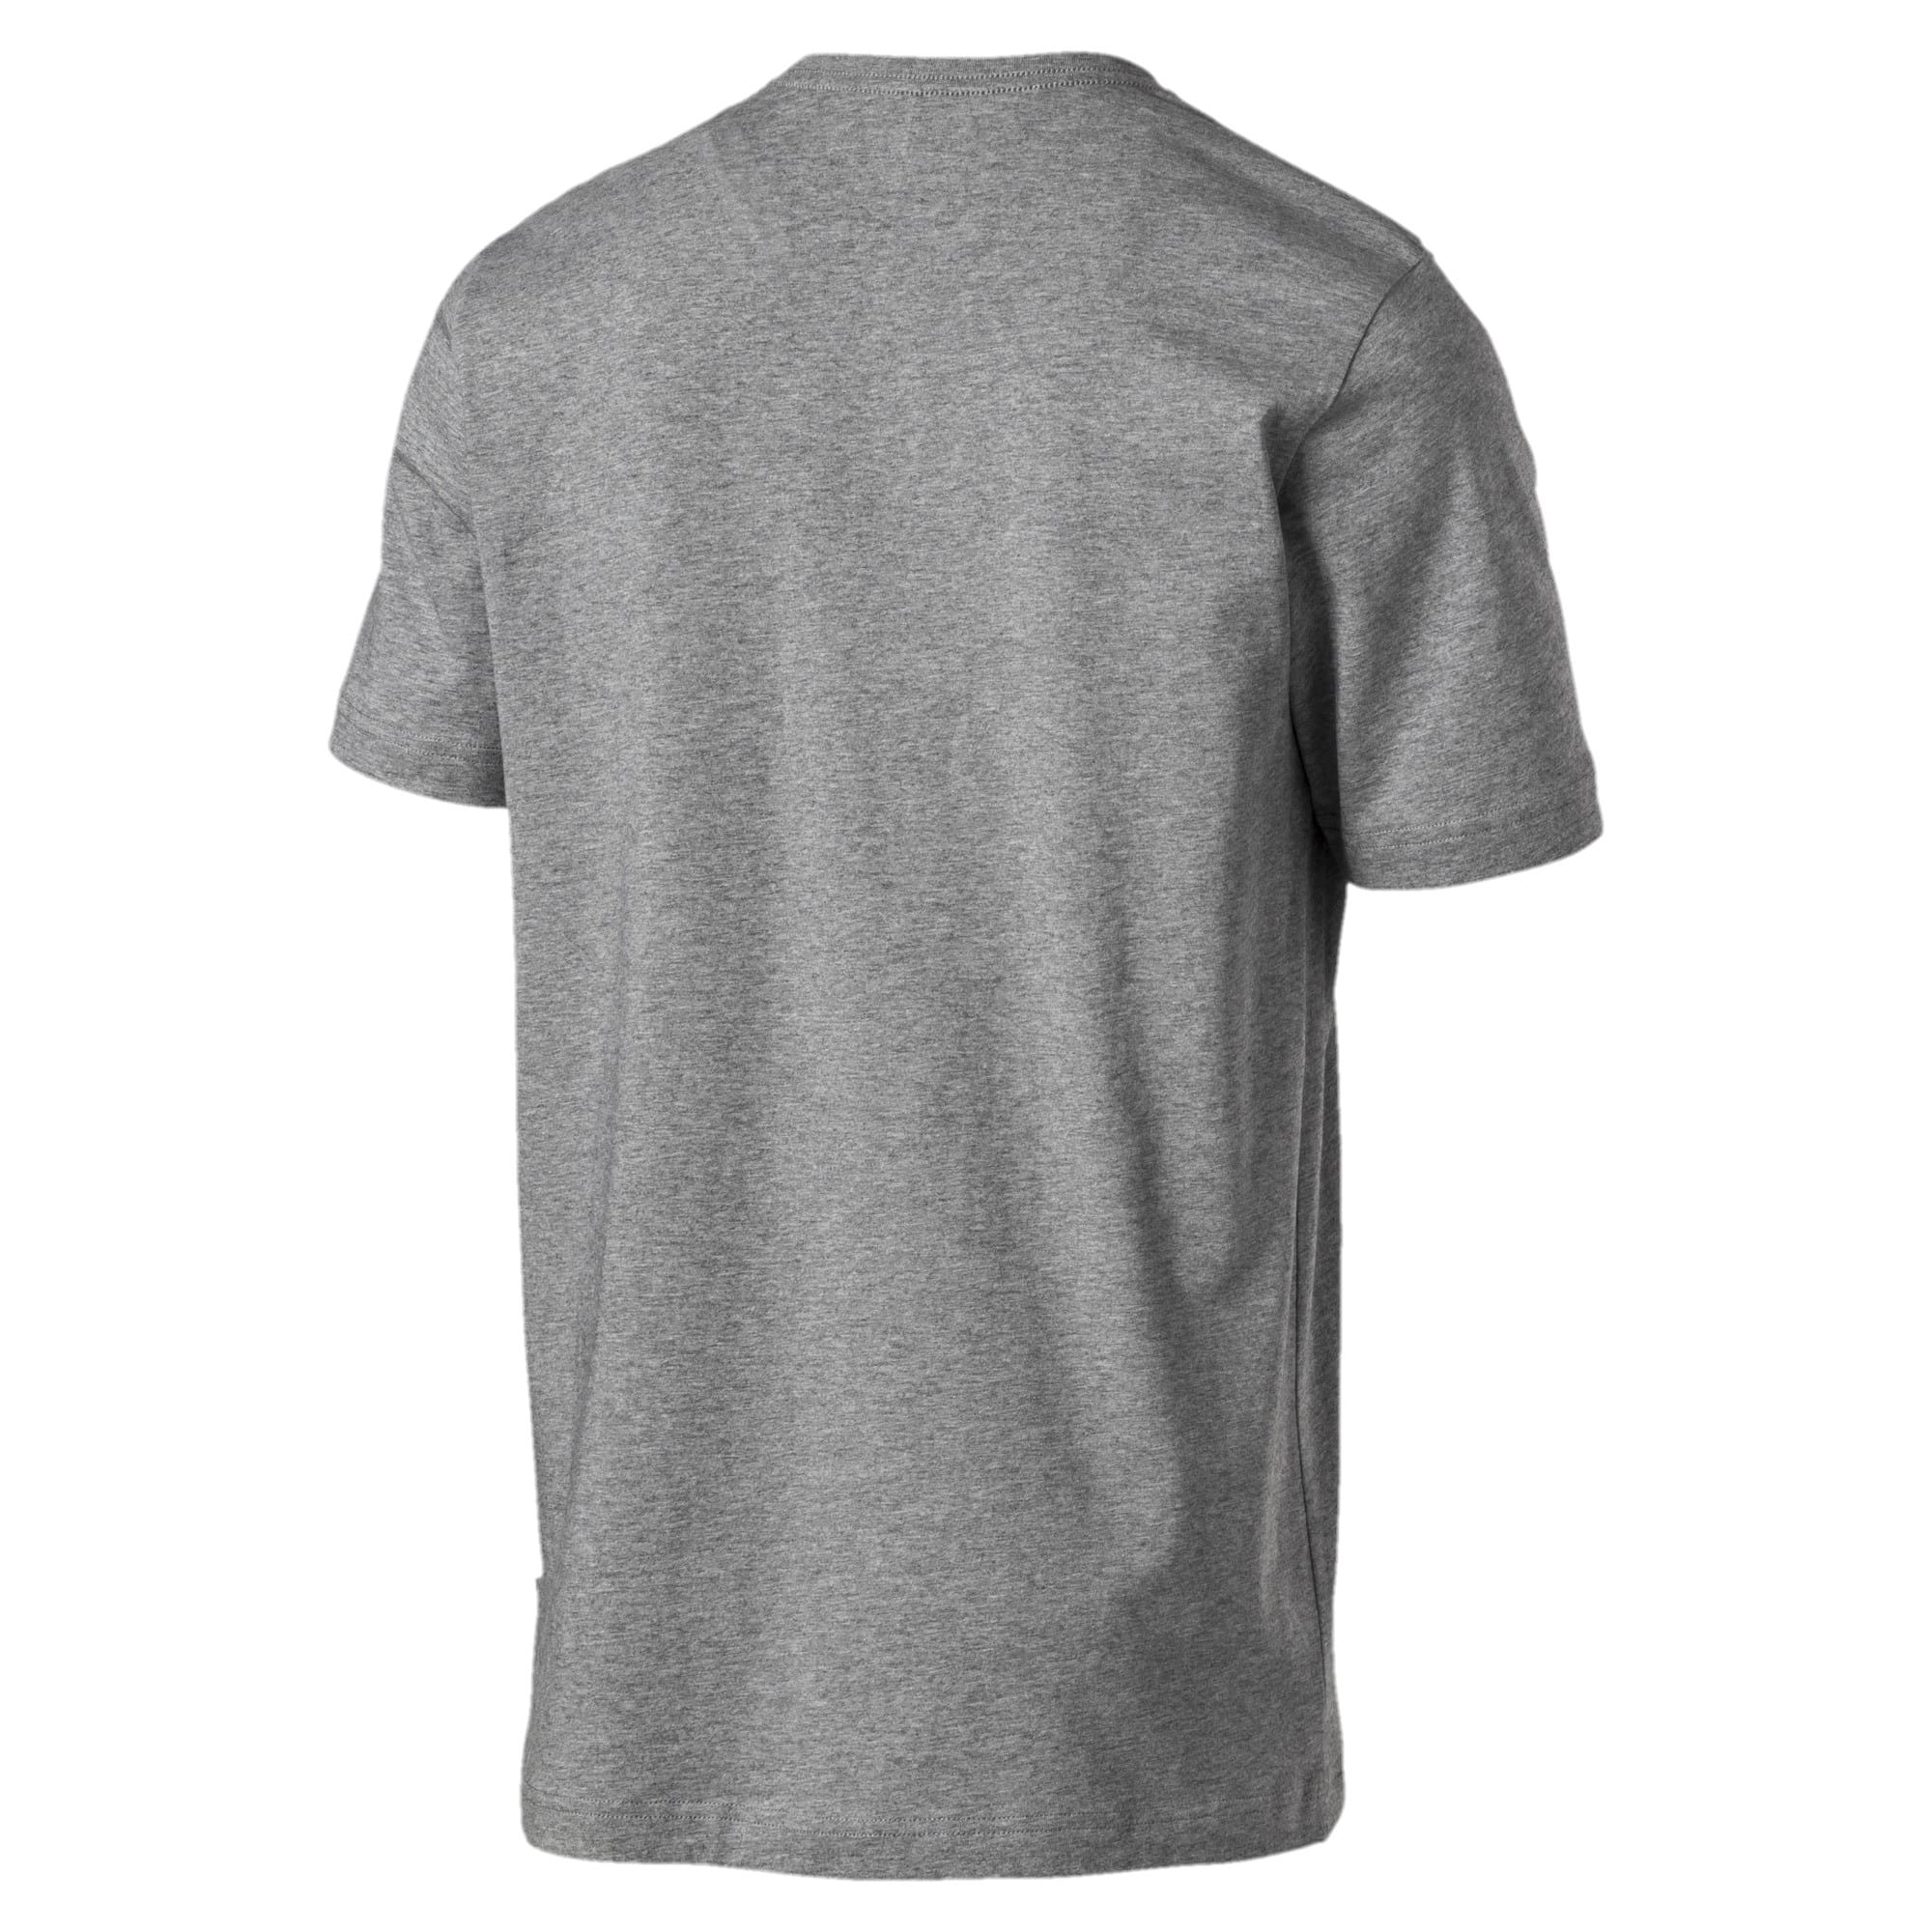 Thumbnail 2 of T-shirt a maniche corte Essentials uomo, Medium Gray Heather, medium